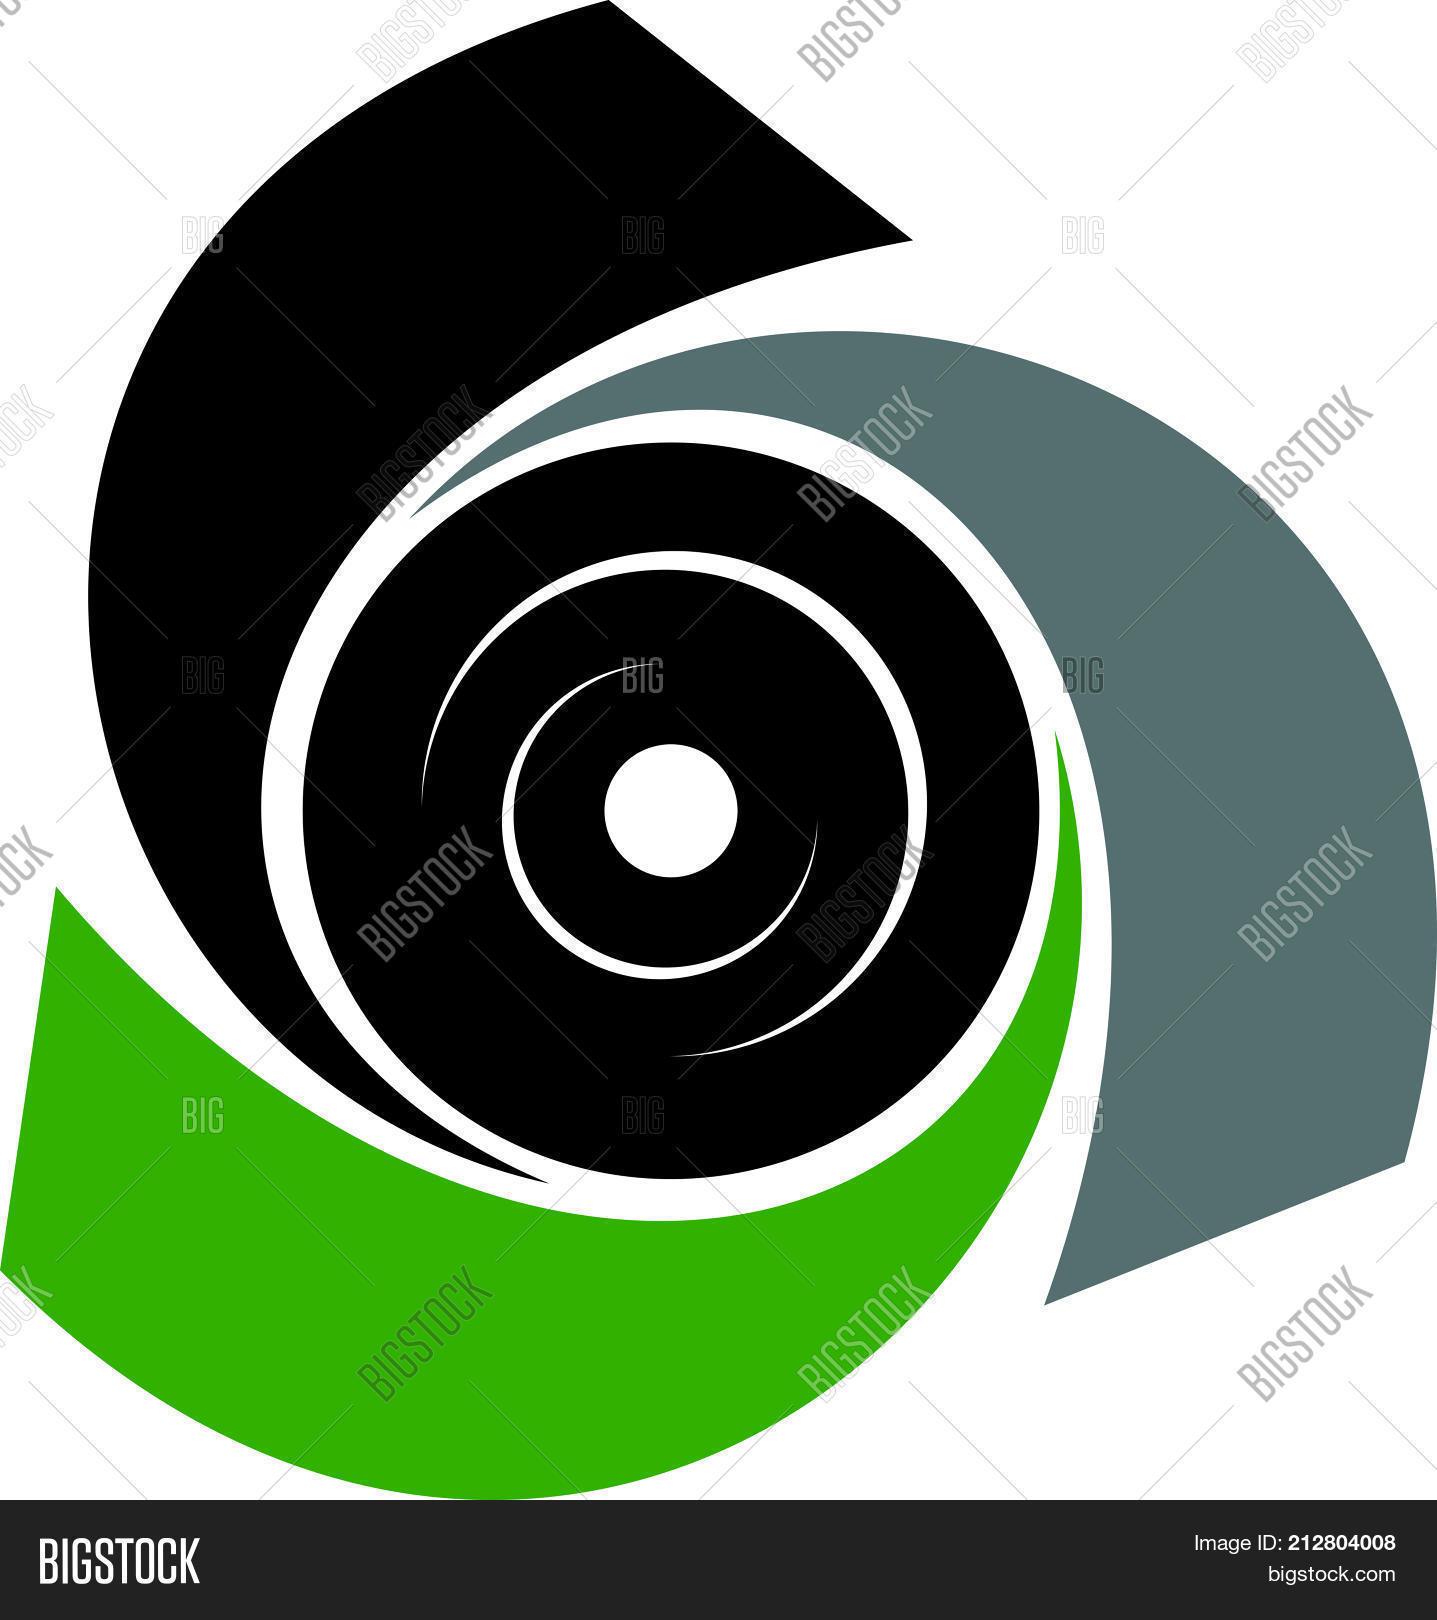 Fabric Supplier Logo Vector & Photo (Free Trial)   Bigstock